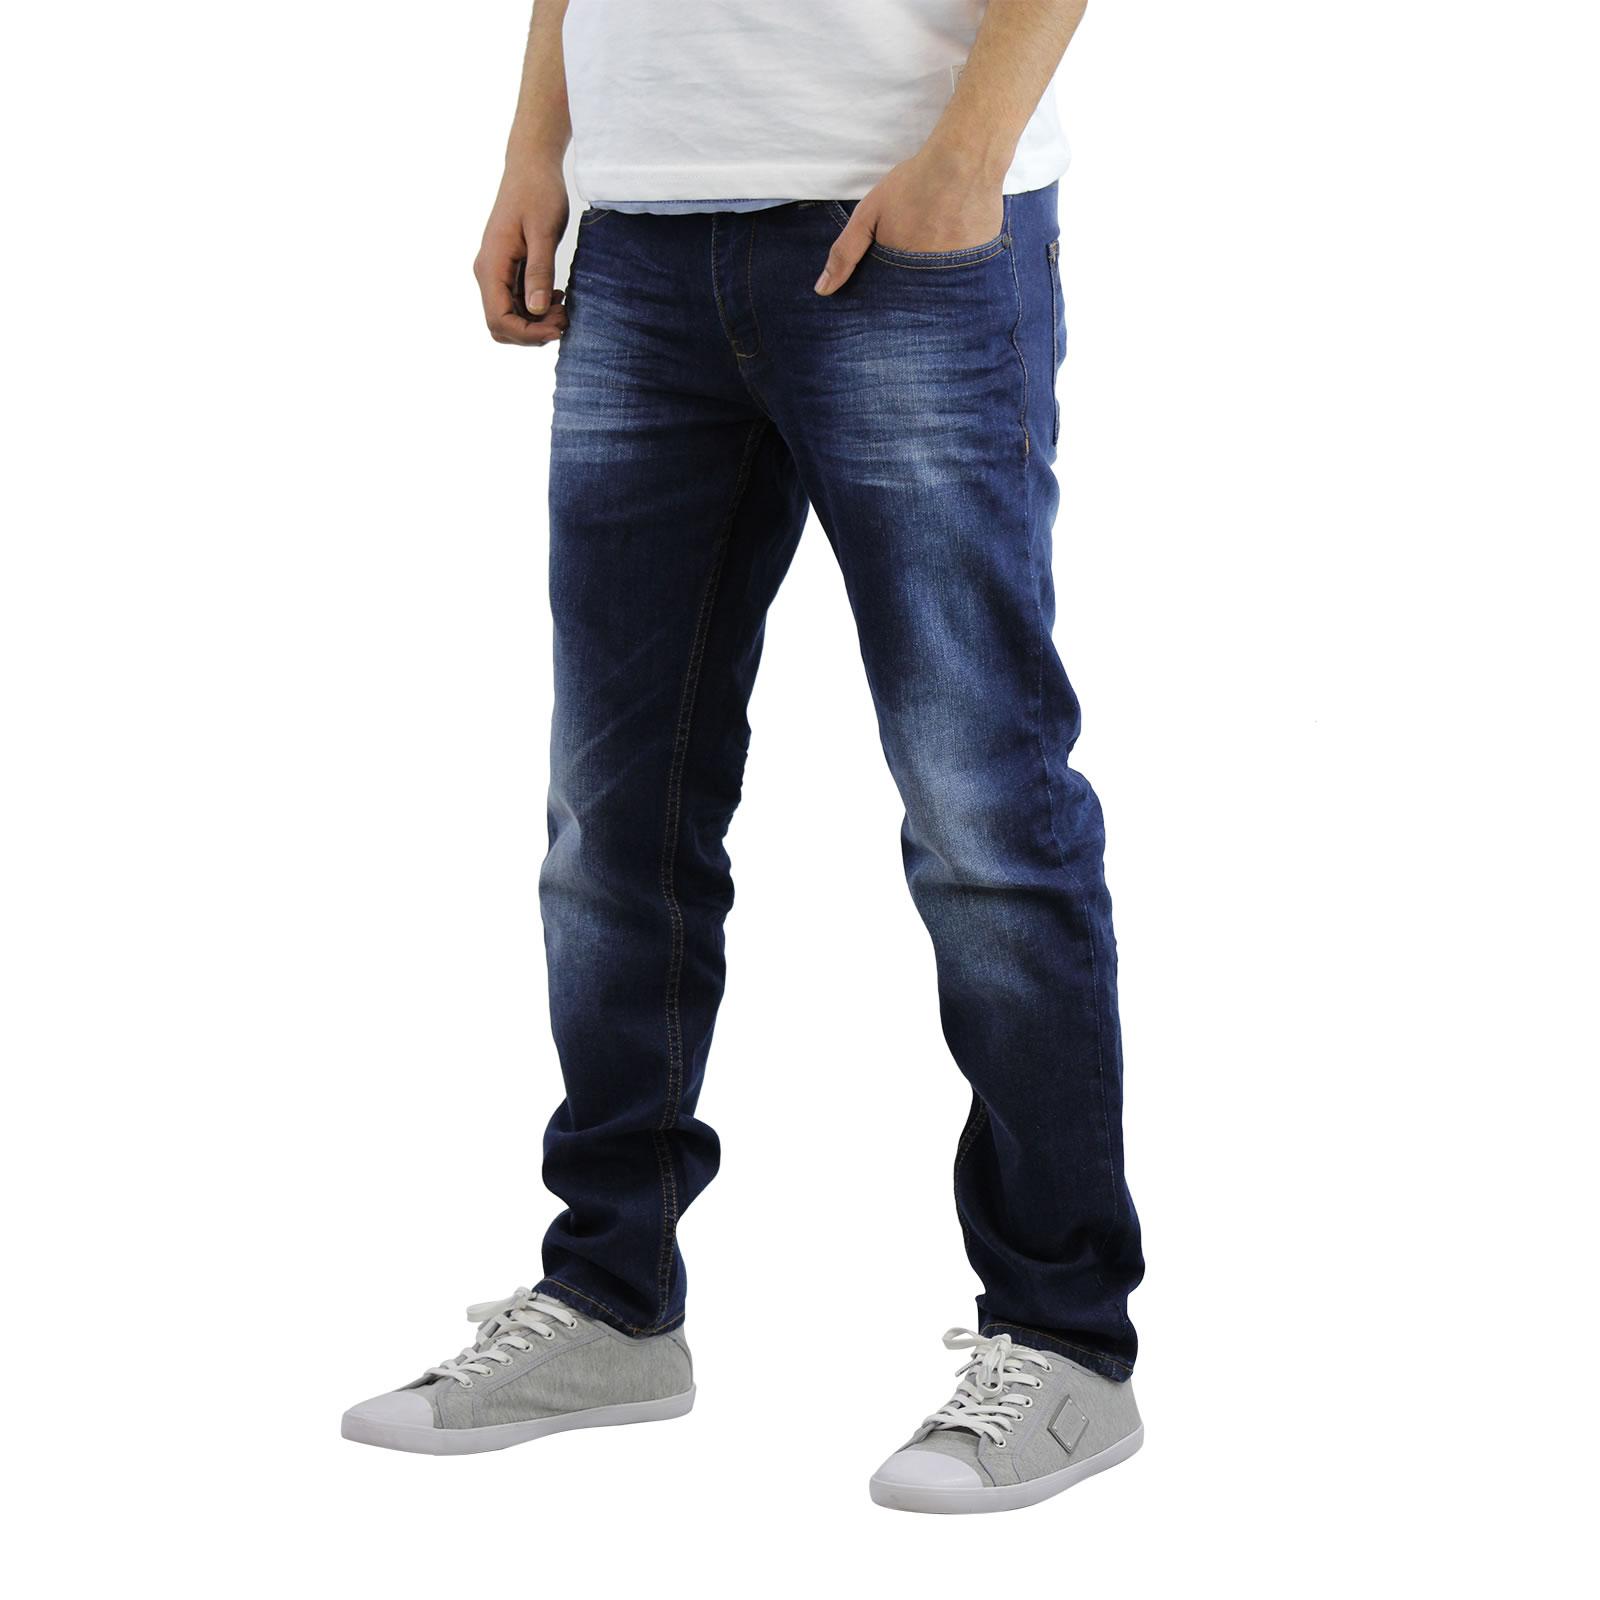 miniature 6 - Homme-Crosshatch-Jaco-Slim-Jeans-stretch-pantalon-denim-effet-vieilli